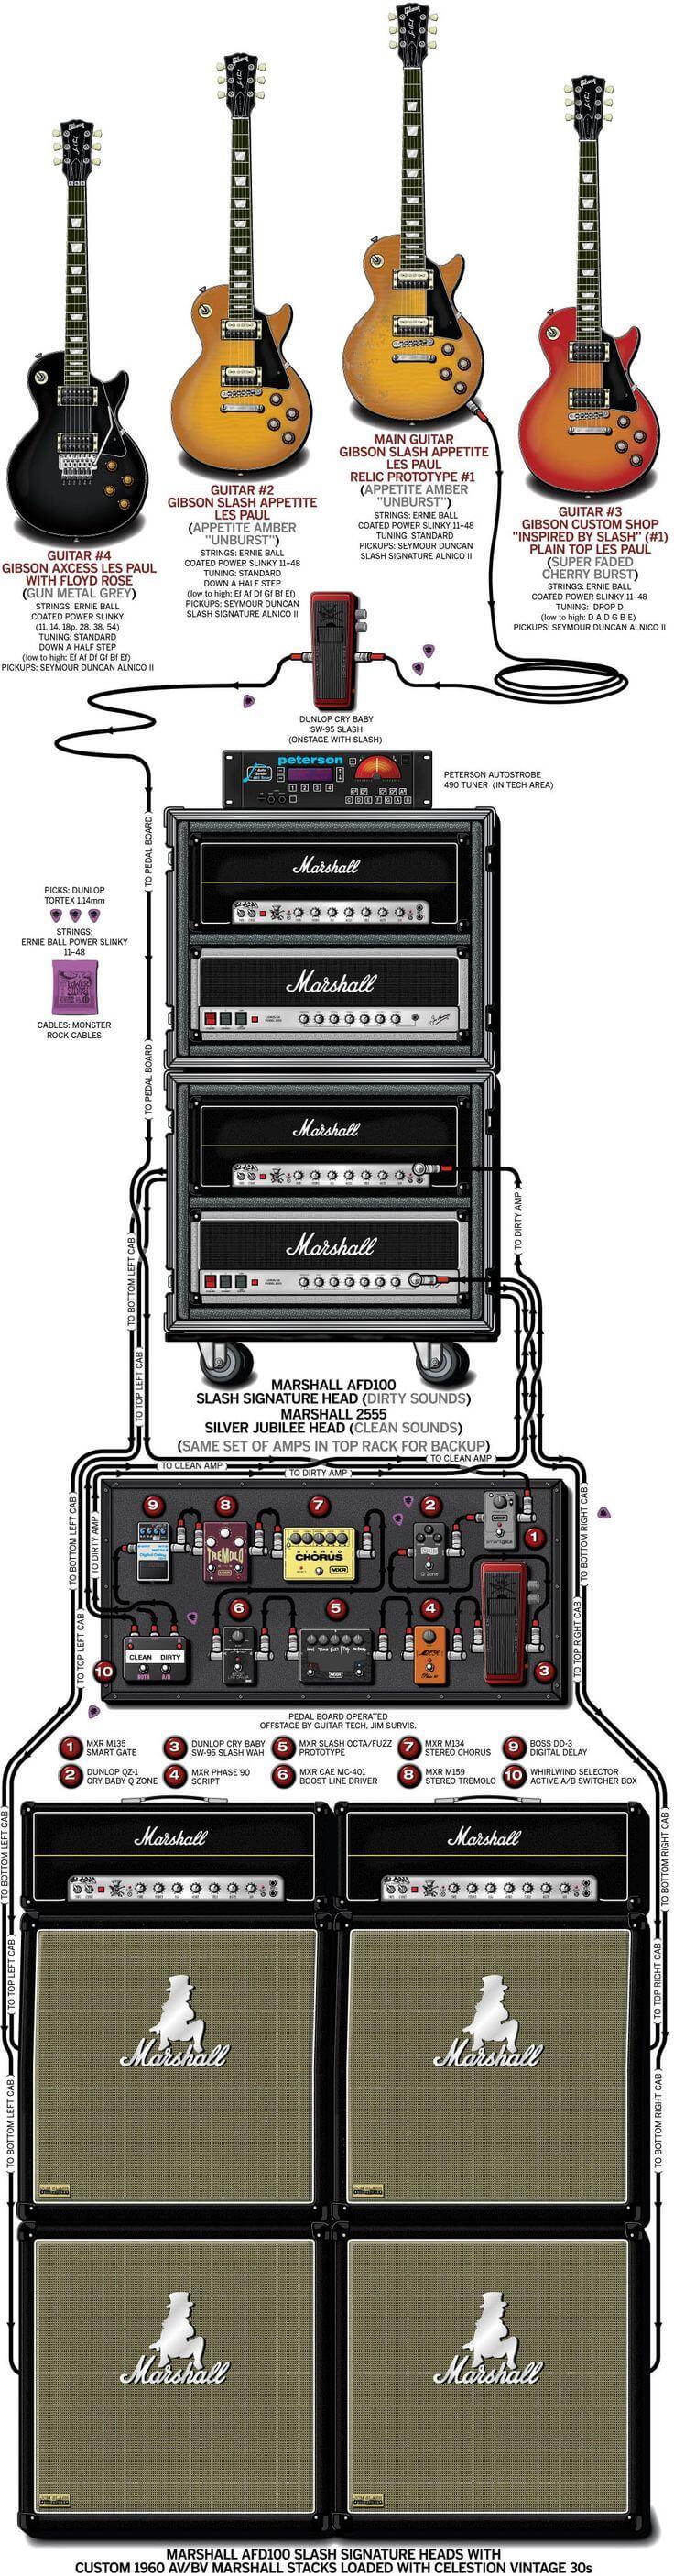 cara memasang gitar ke ampli lengkap dengan efeknya